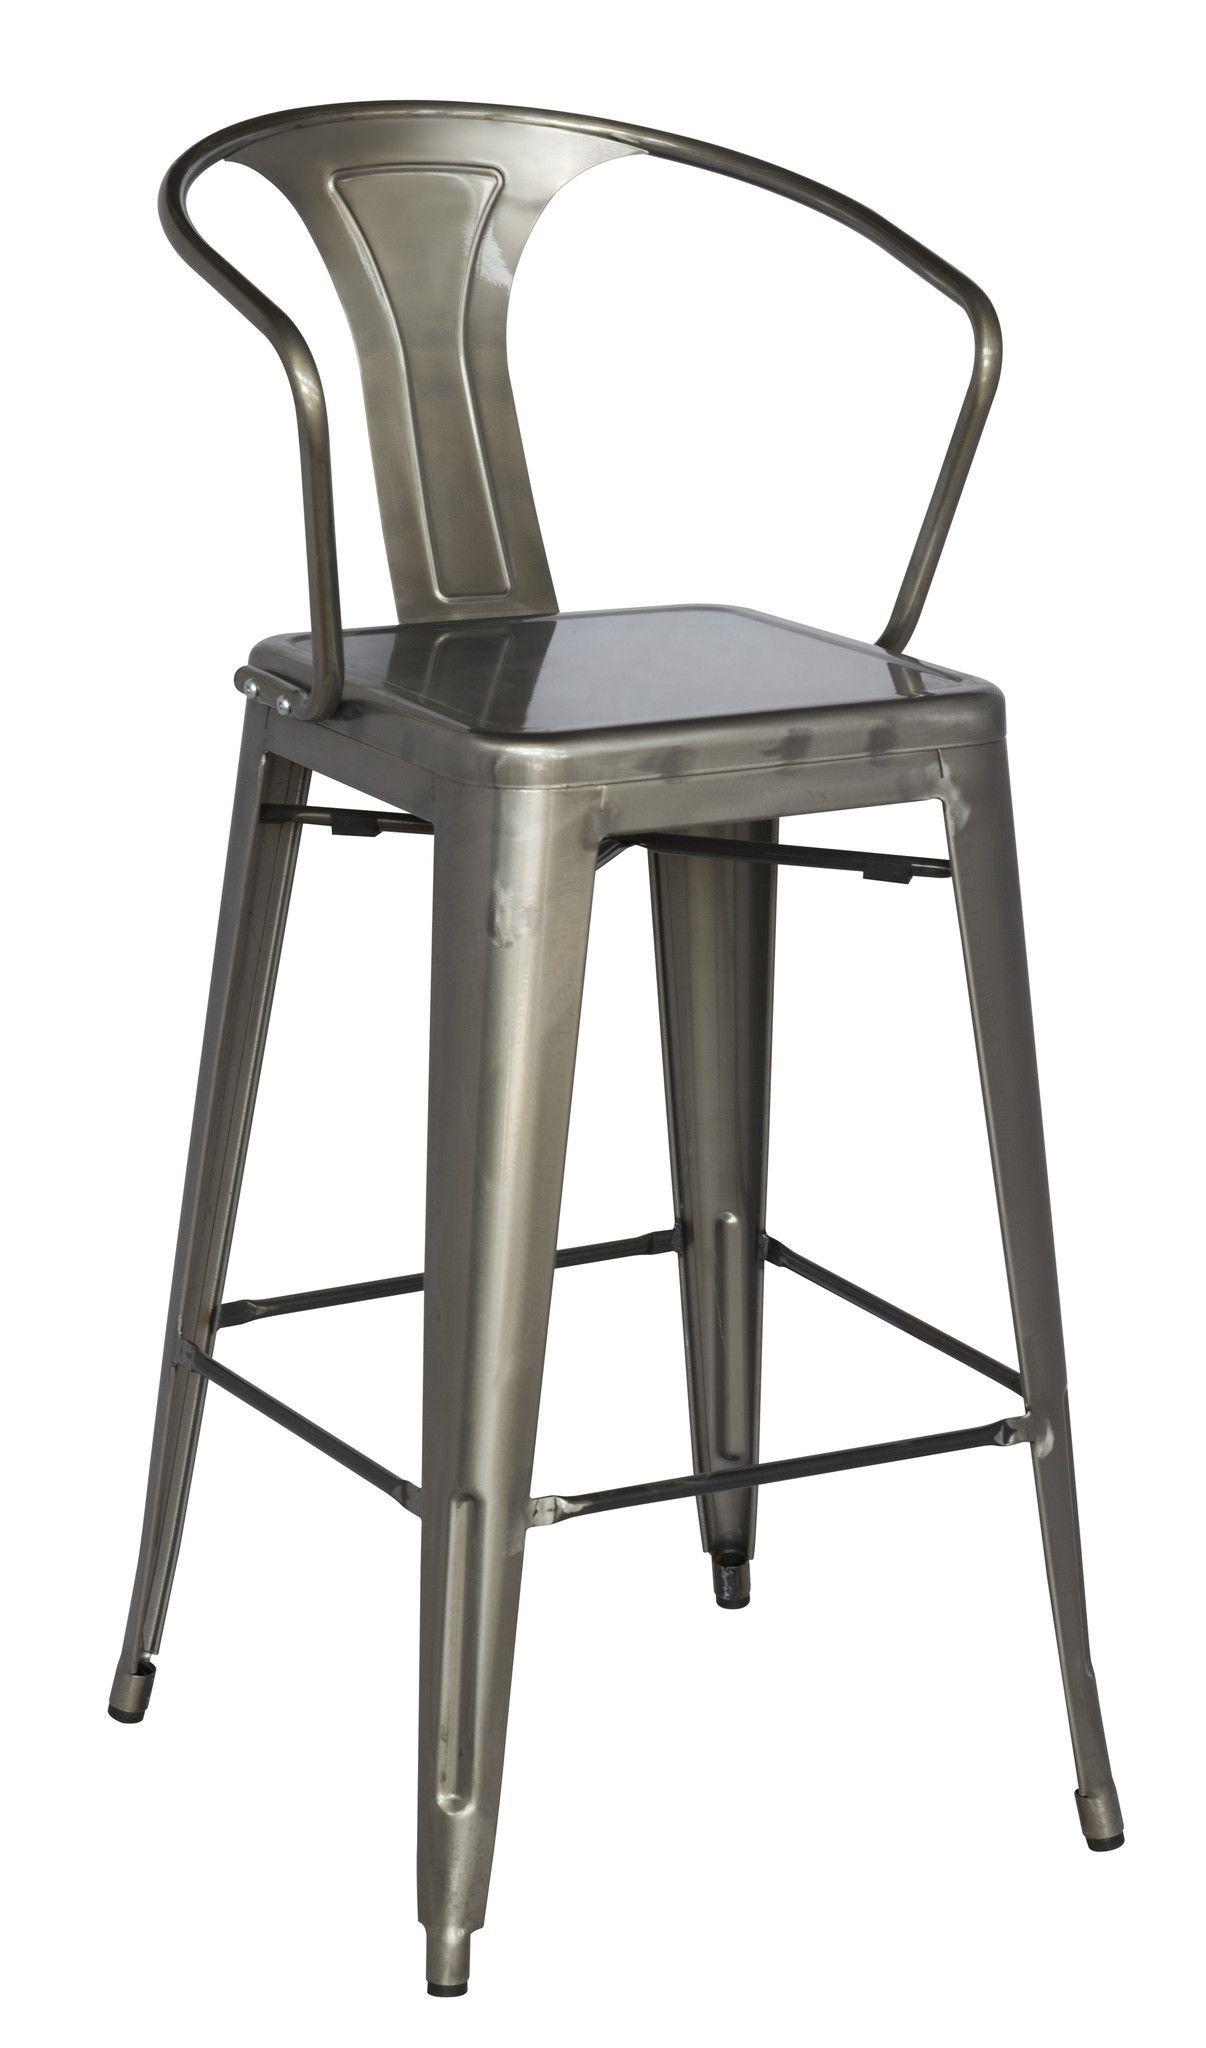 Galvanized Steel Bar Stool Set Of 4 Steel Bar Stools Bar